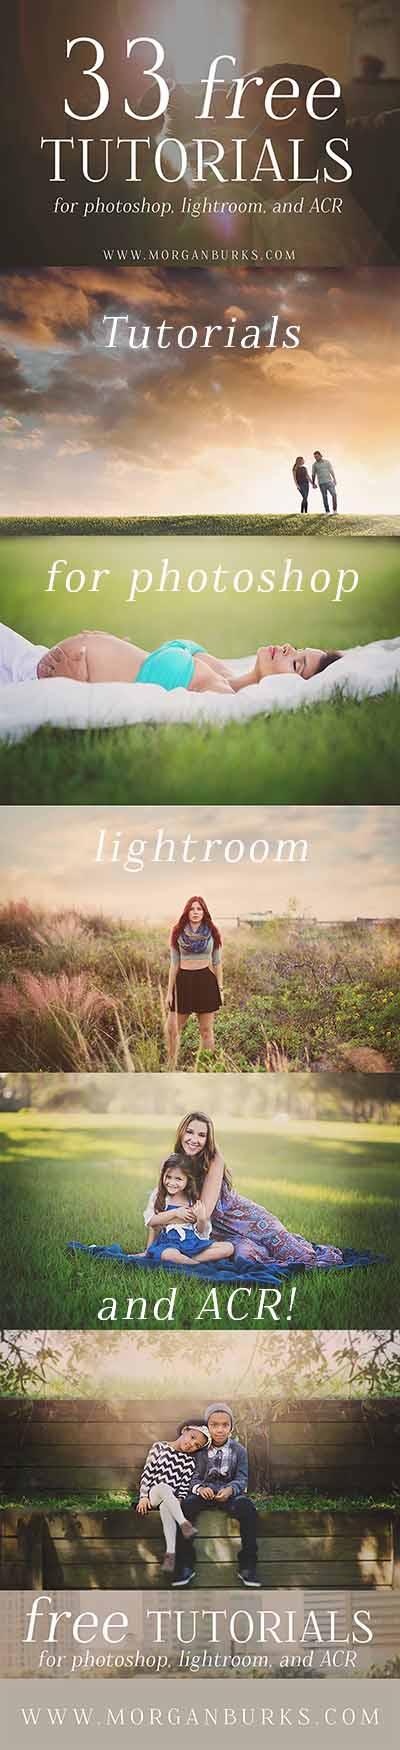 33 Free Tutorials For Photoshop Lightroom ACR